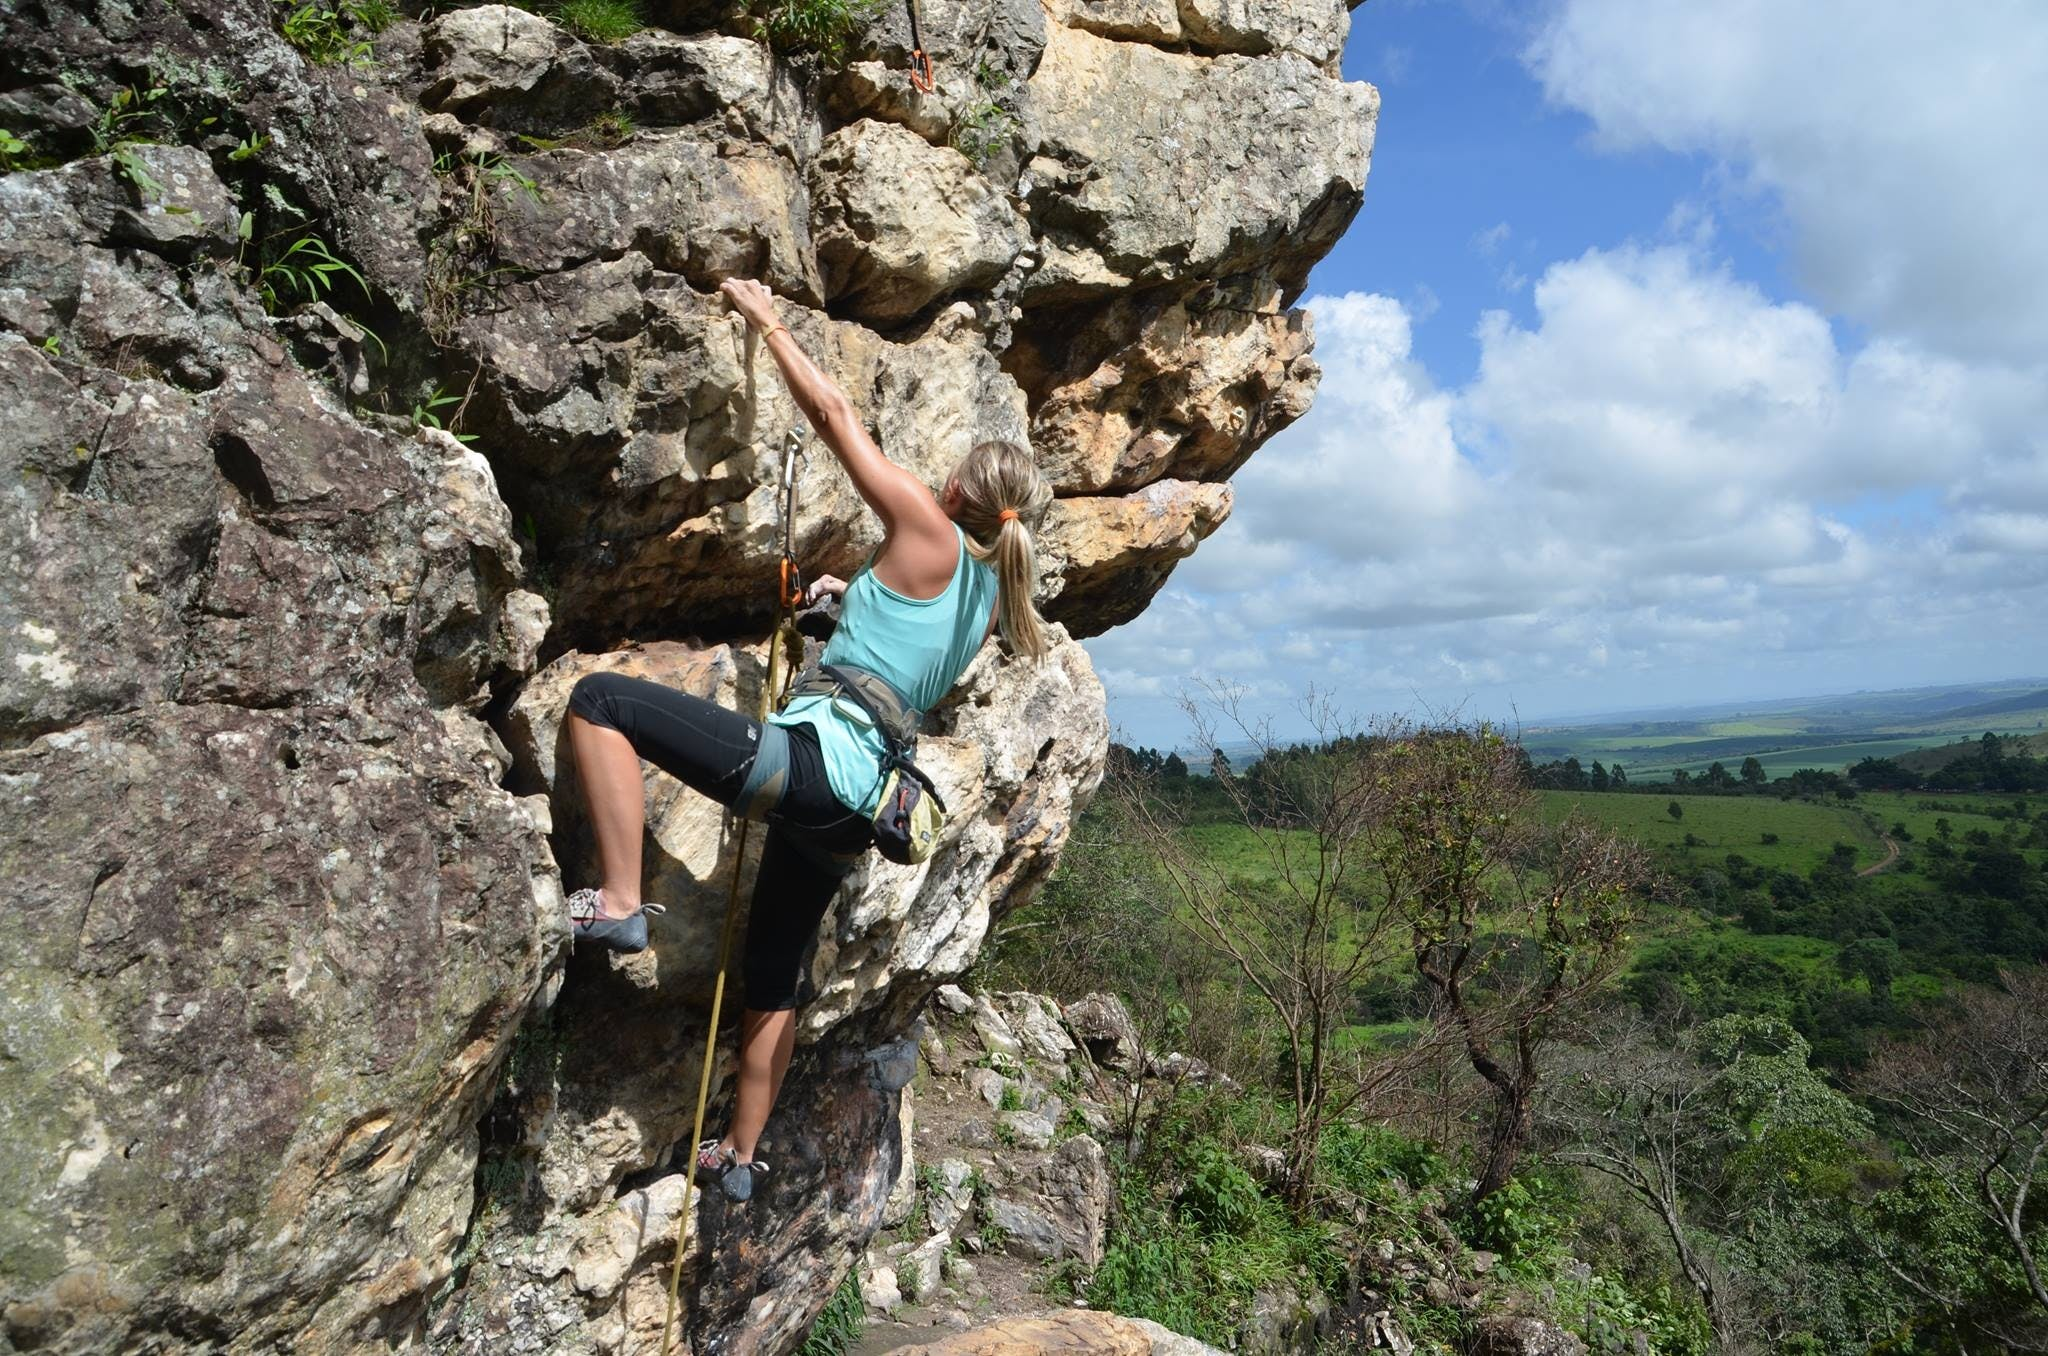 Free stock photo of nature, sport, climbing, mountaineering